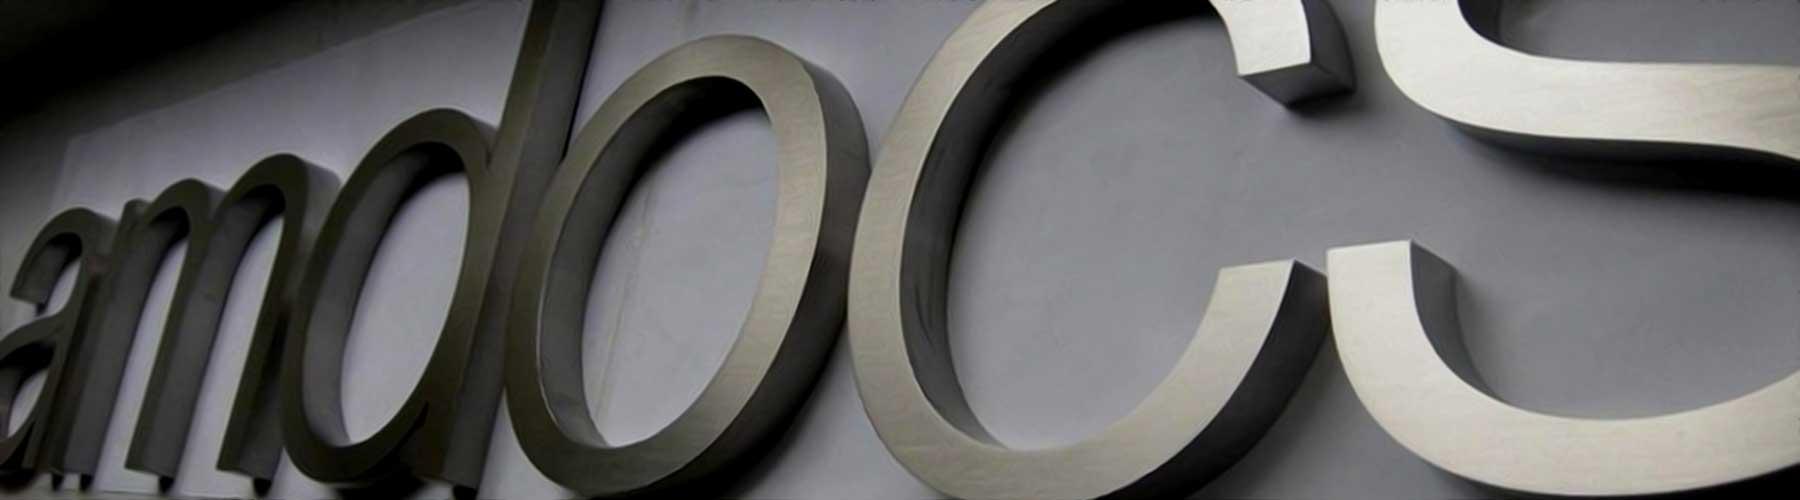 lettere-in-acciaio-retroilluminate